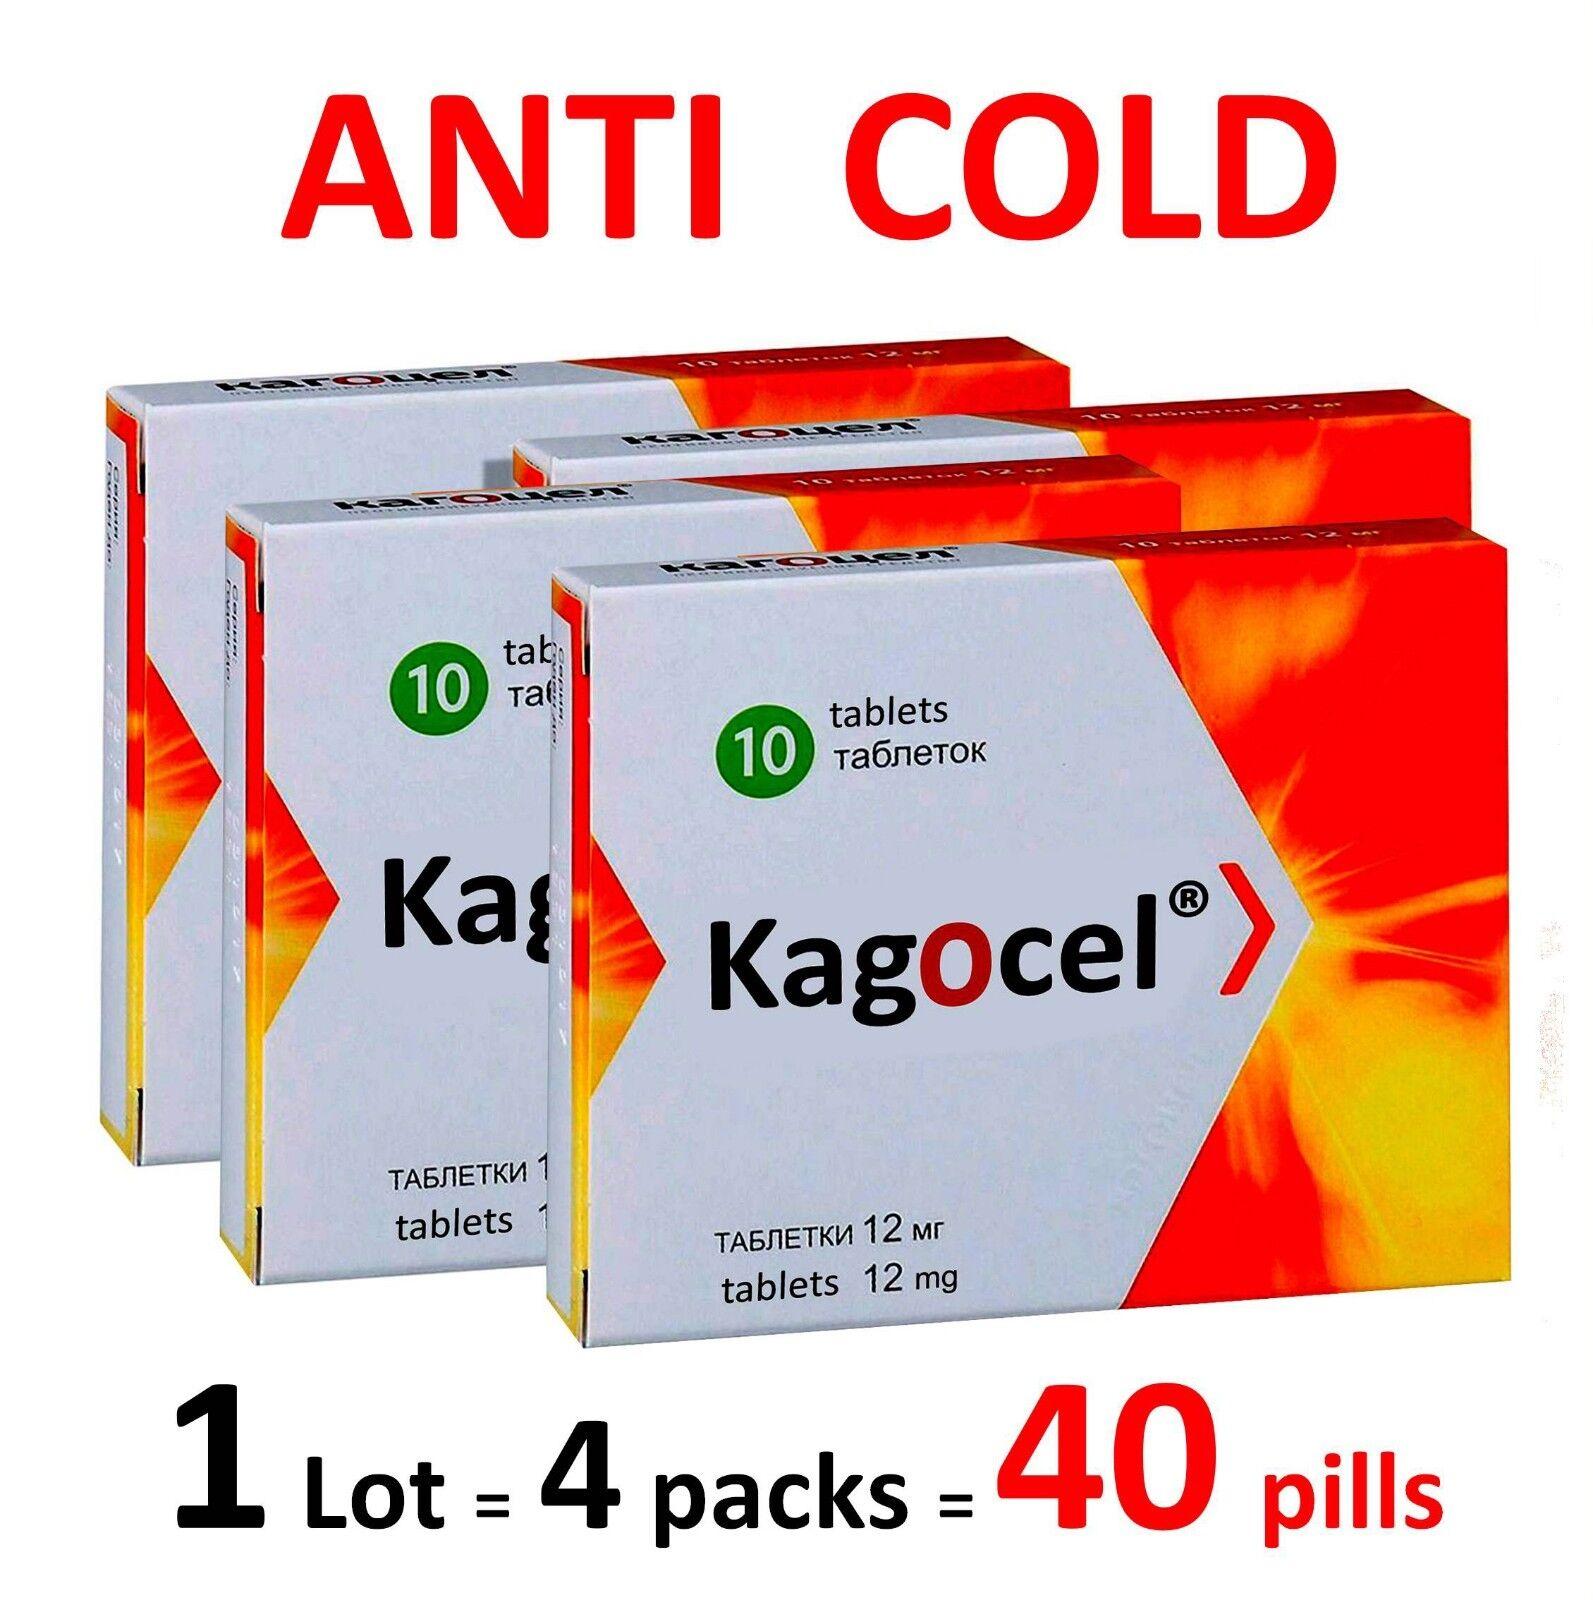 Kagocel. ANTI COLD. 1 Lot=4 pack = 40 pills30mg. Кагоцел.